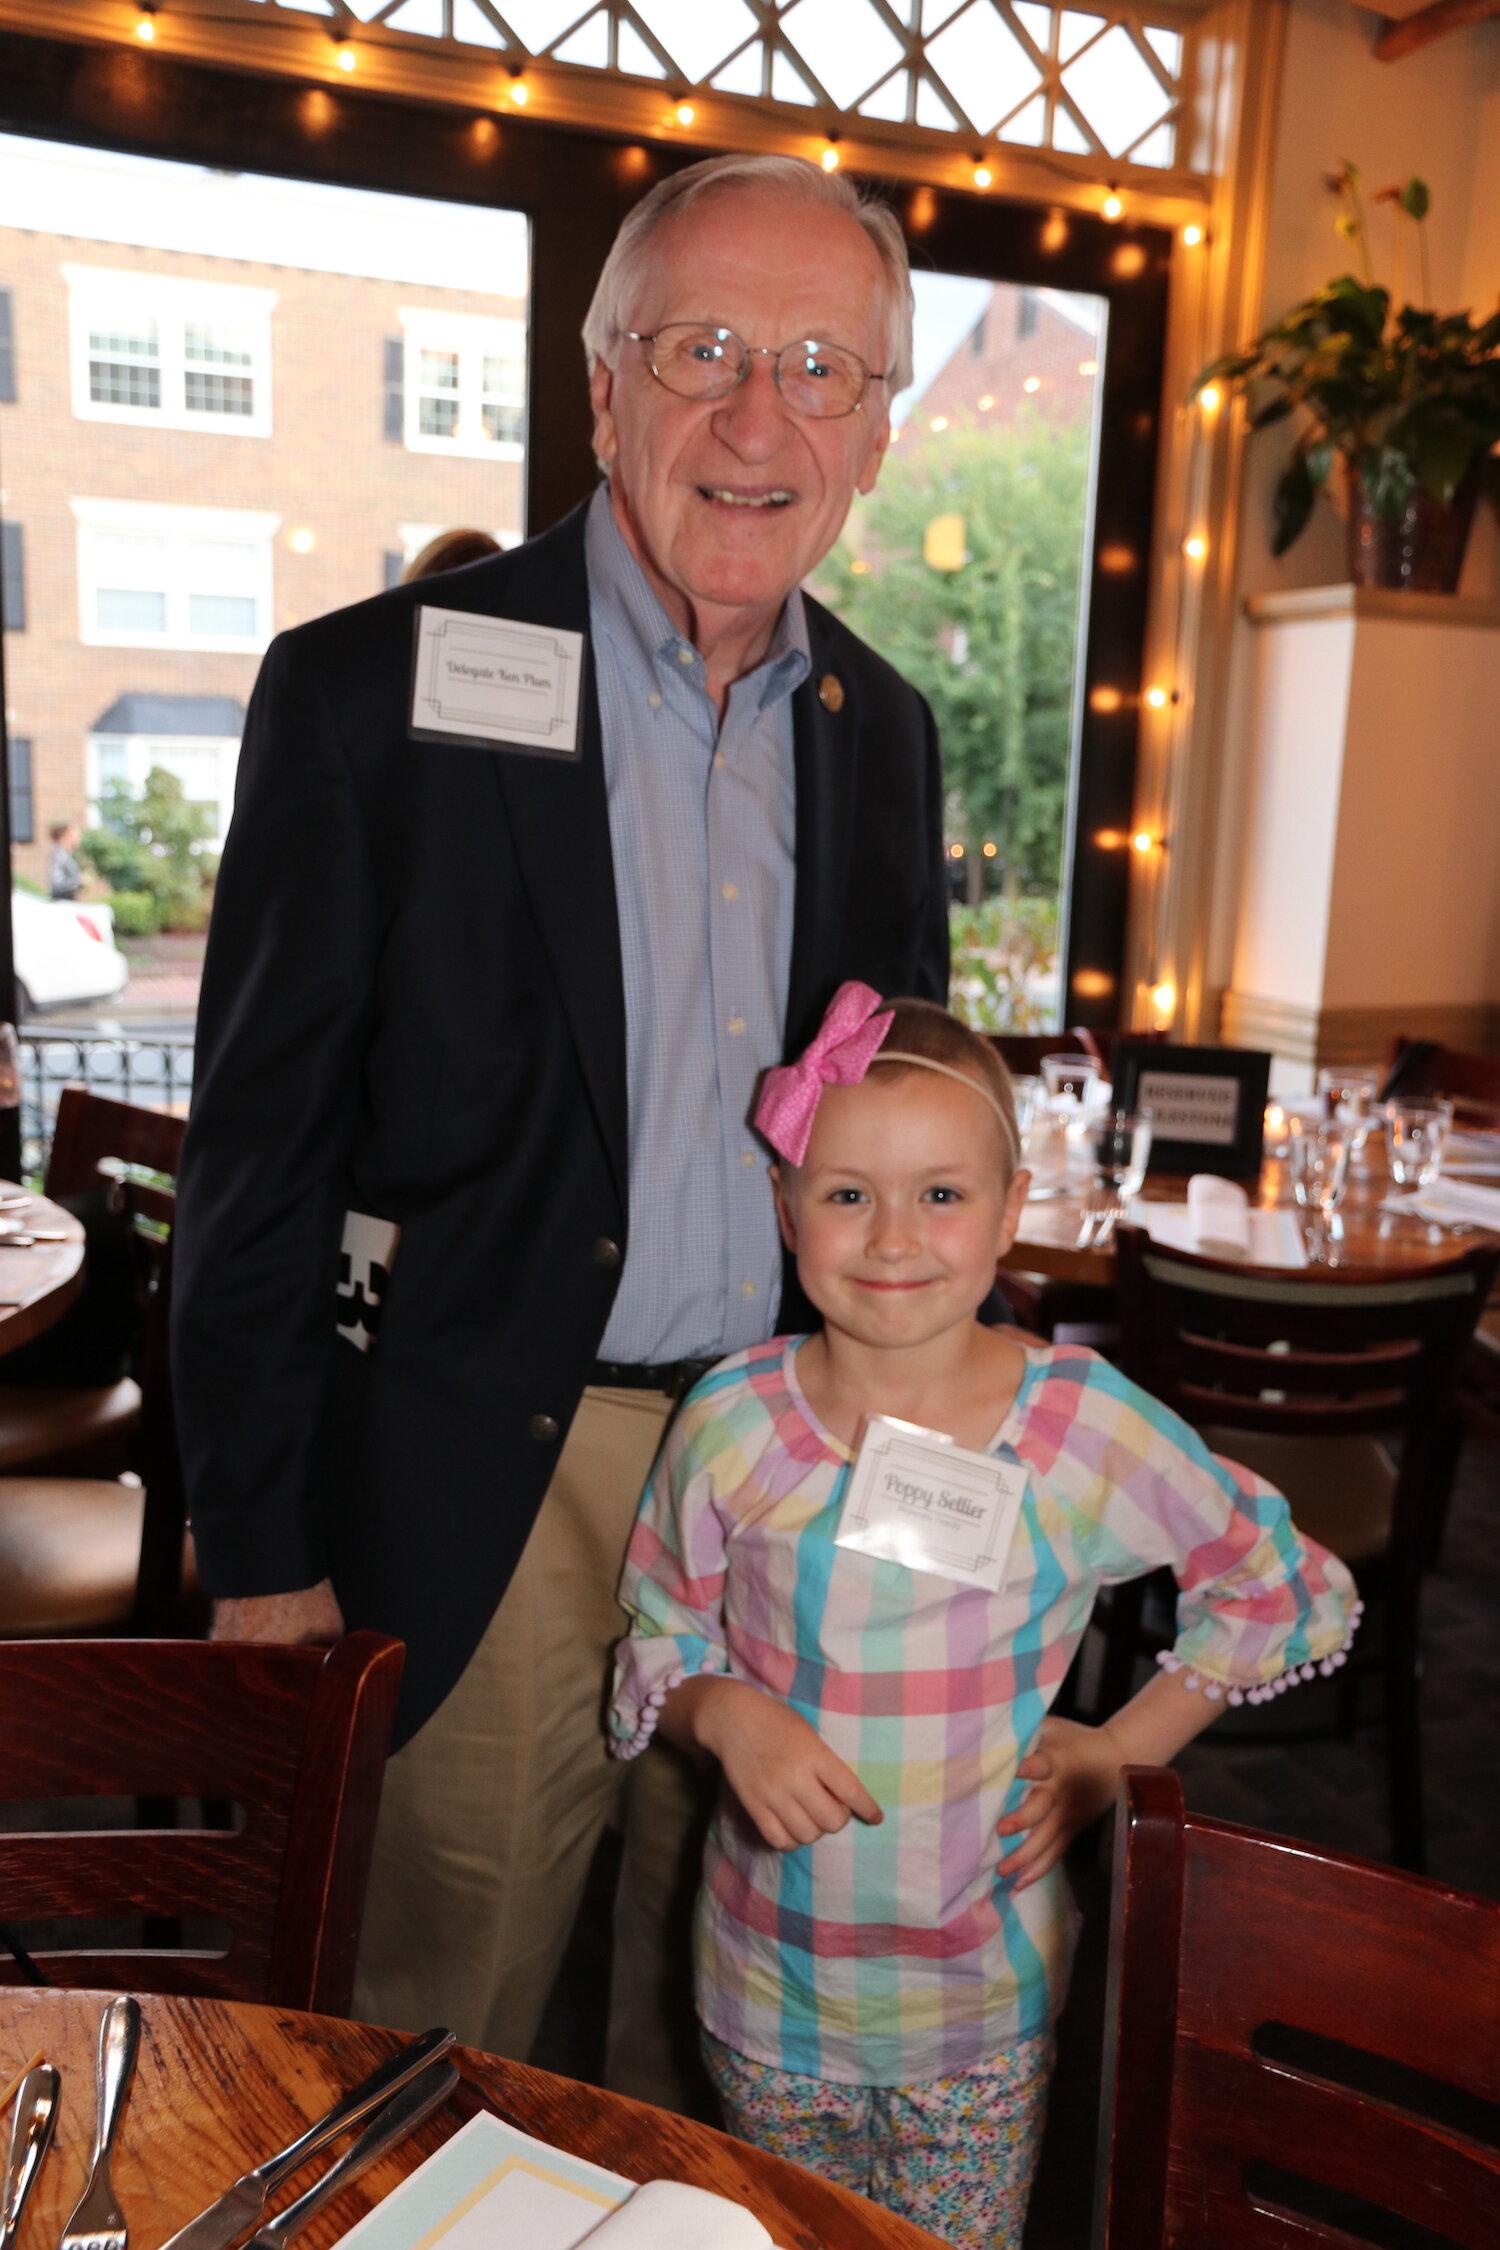 Virginia Delegate Kenneth R. Plum and Hopecam Child Poppy